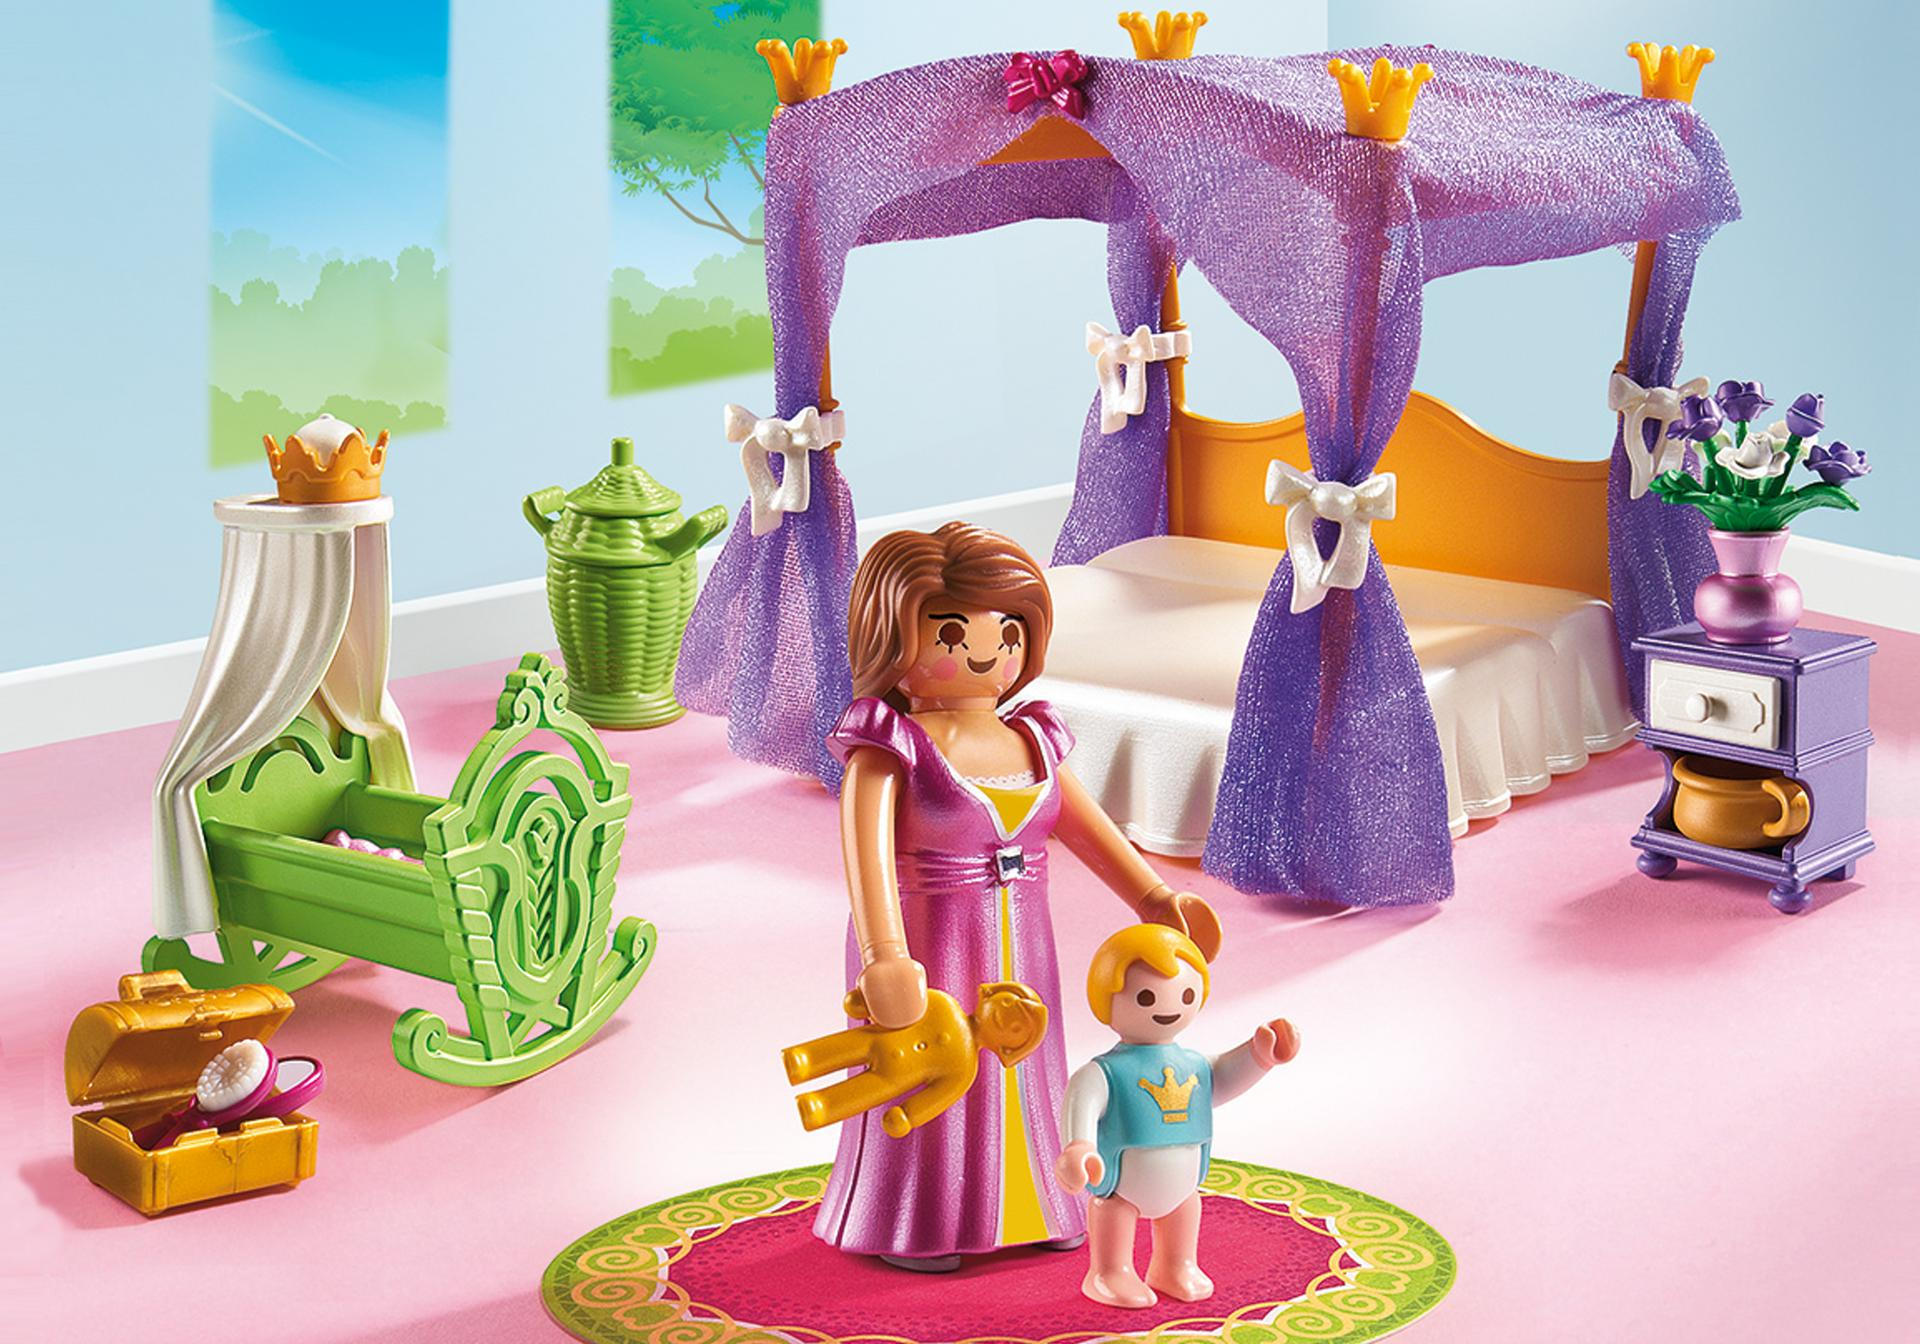 httpmediaplaymobilcomiplaymobil6851_product_detail - Playmobil Chambres Princesses